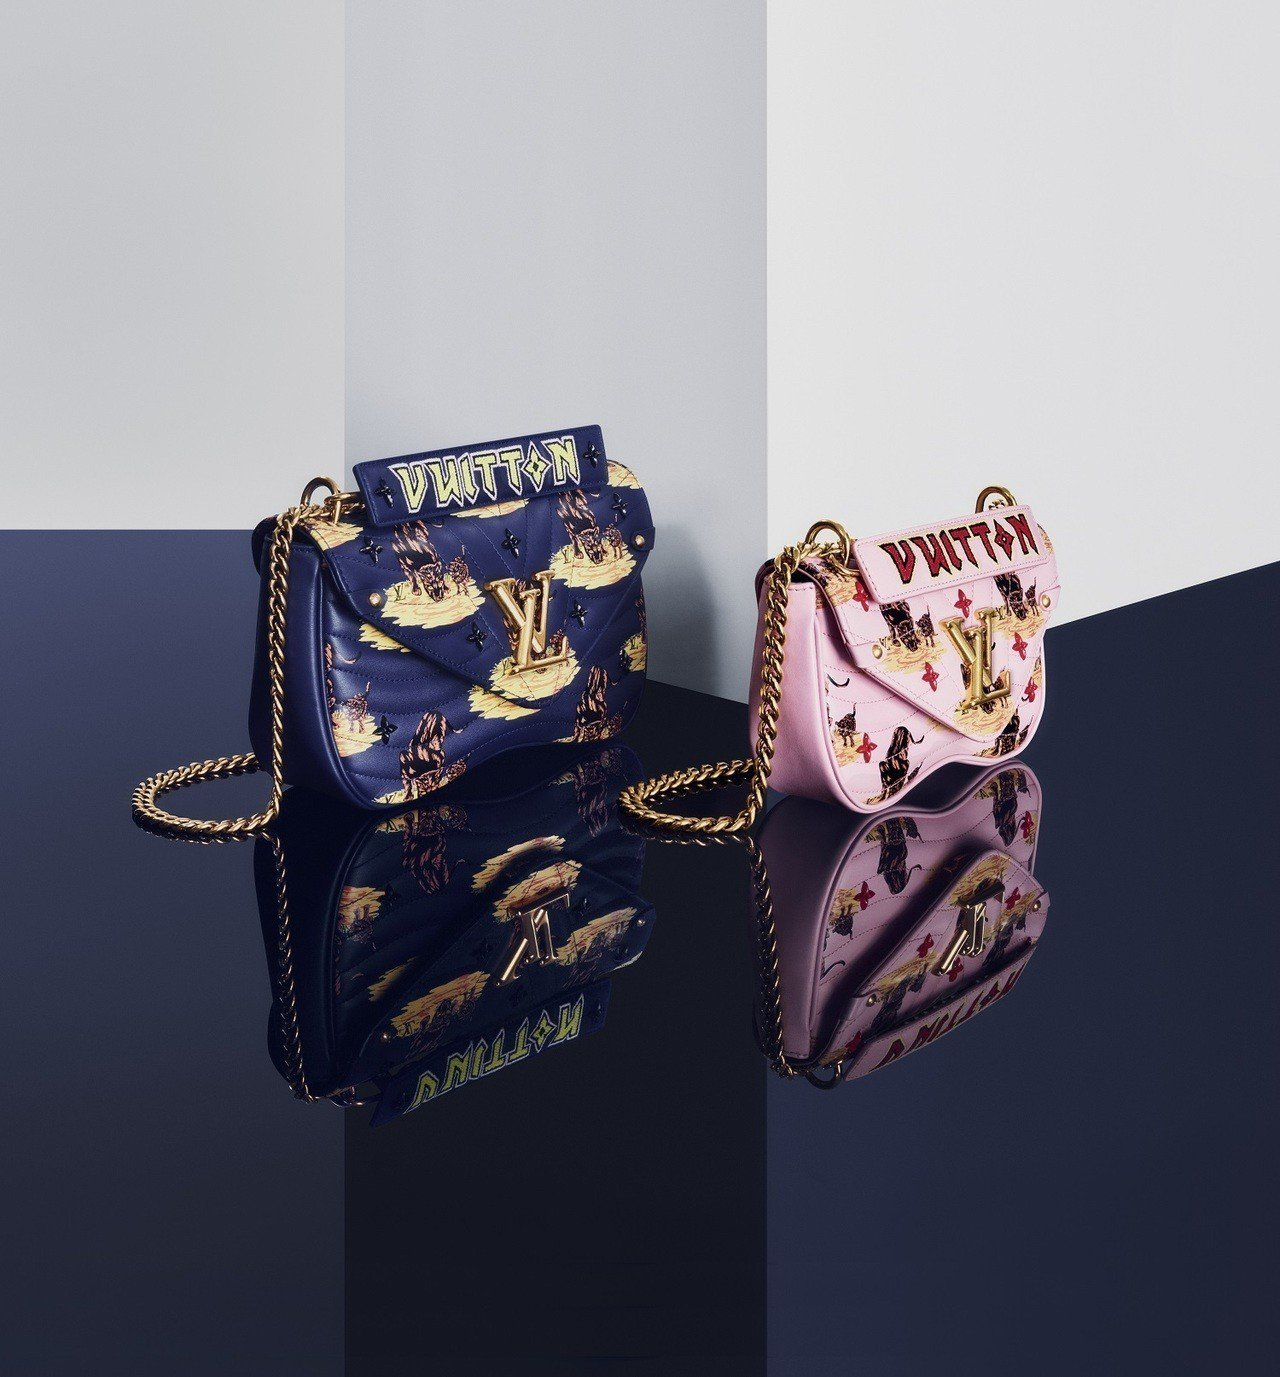 New Wave美洲豹刺繡款預計會吸引品牌粉絲購入作為蒐藏用。圖/LV提供